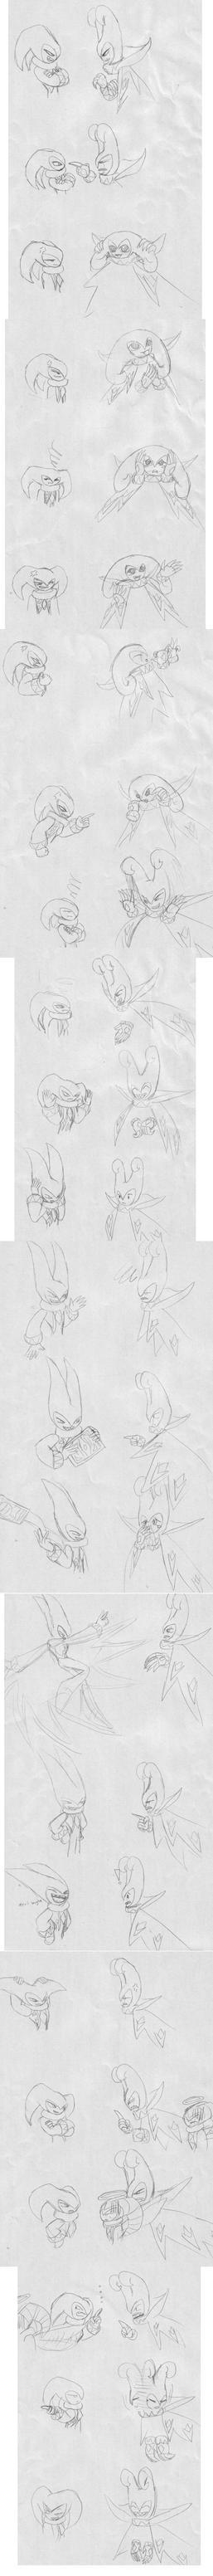 NiGHTS and Jackle comic by Feniiku